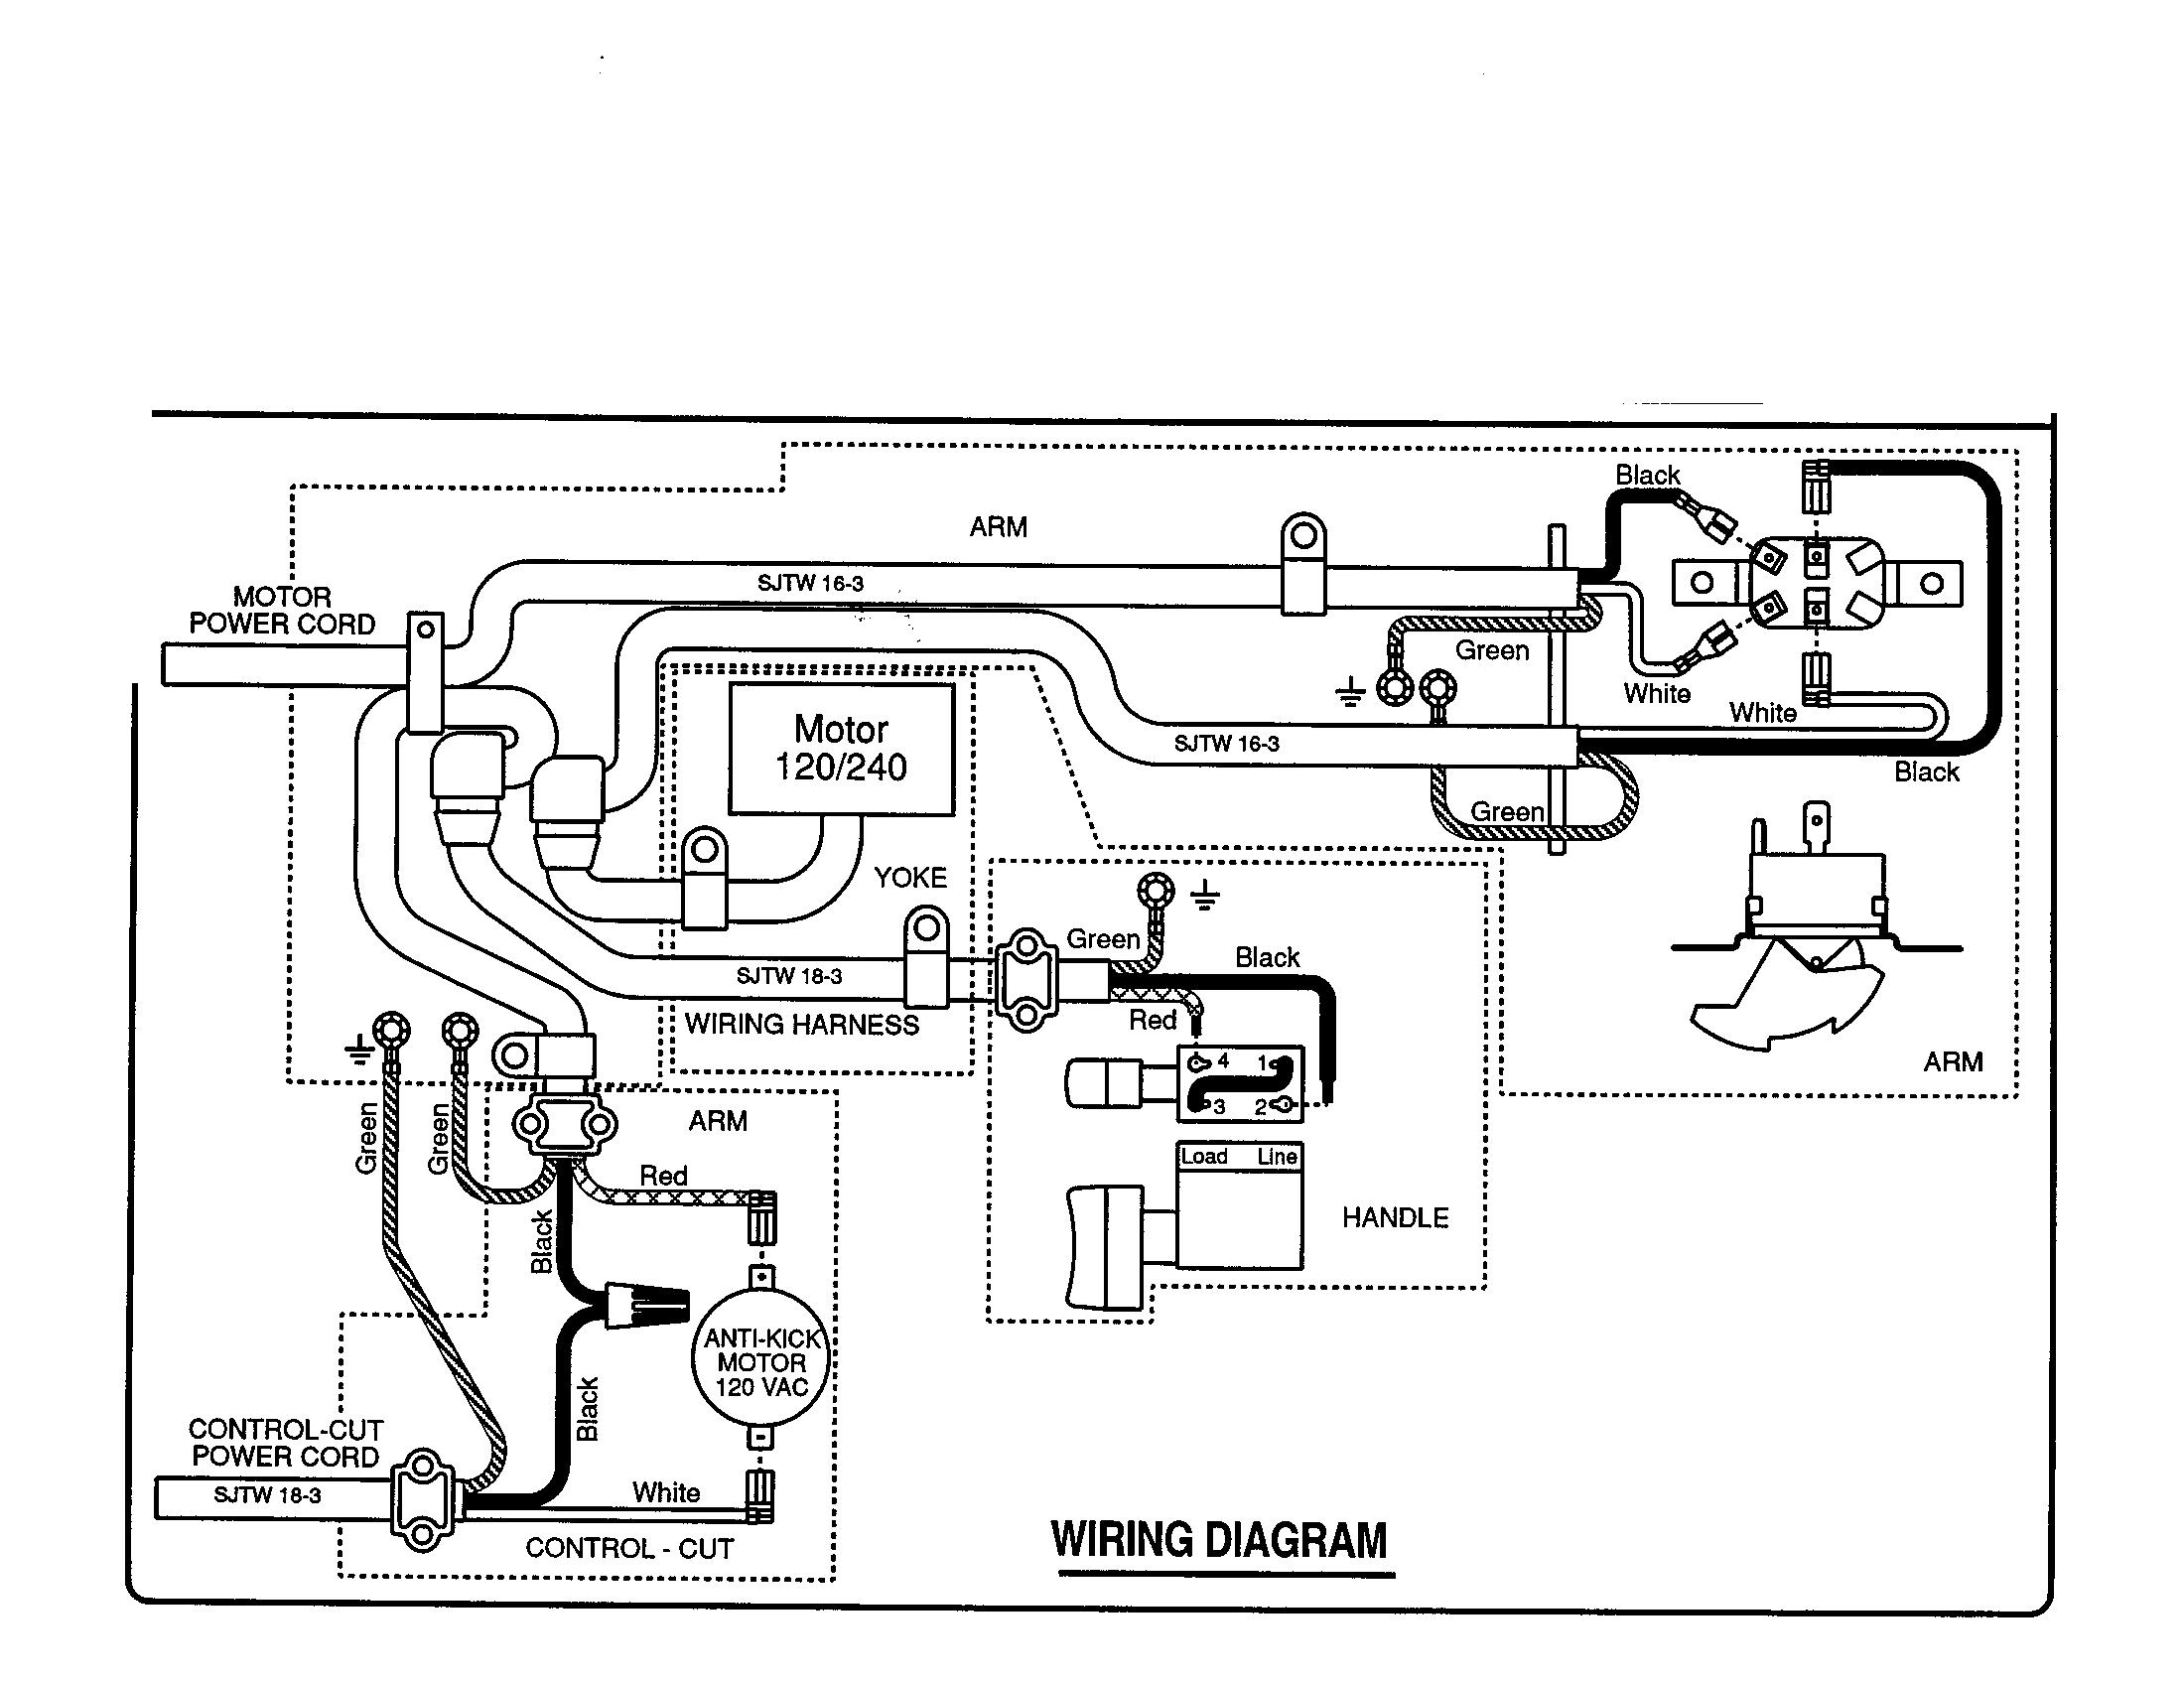 Furnace Controls And Wiring Demands – Intertherm Furnace Damper Wiring-diagram